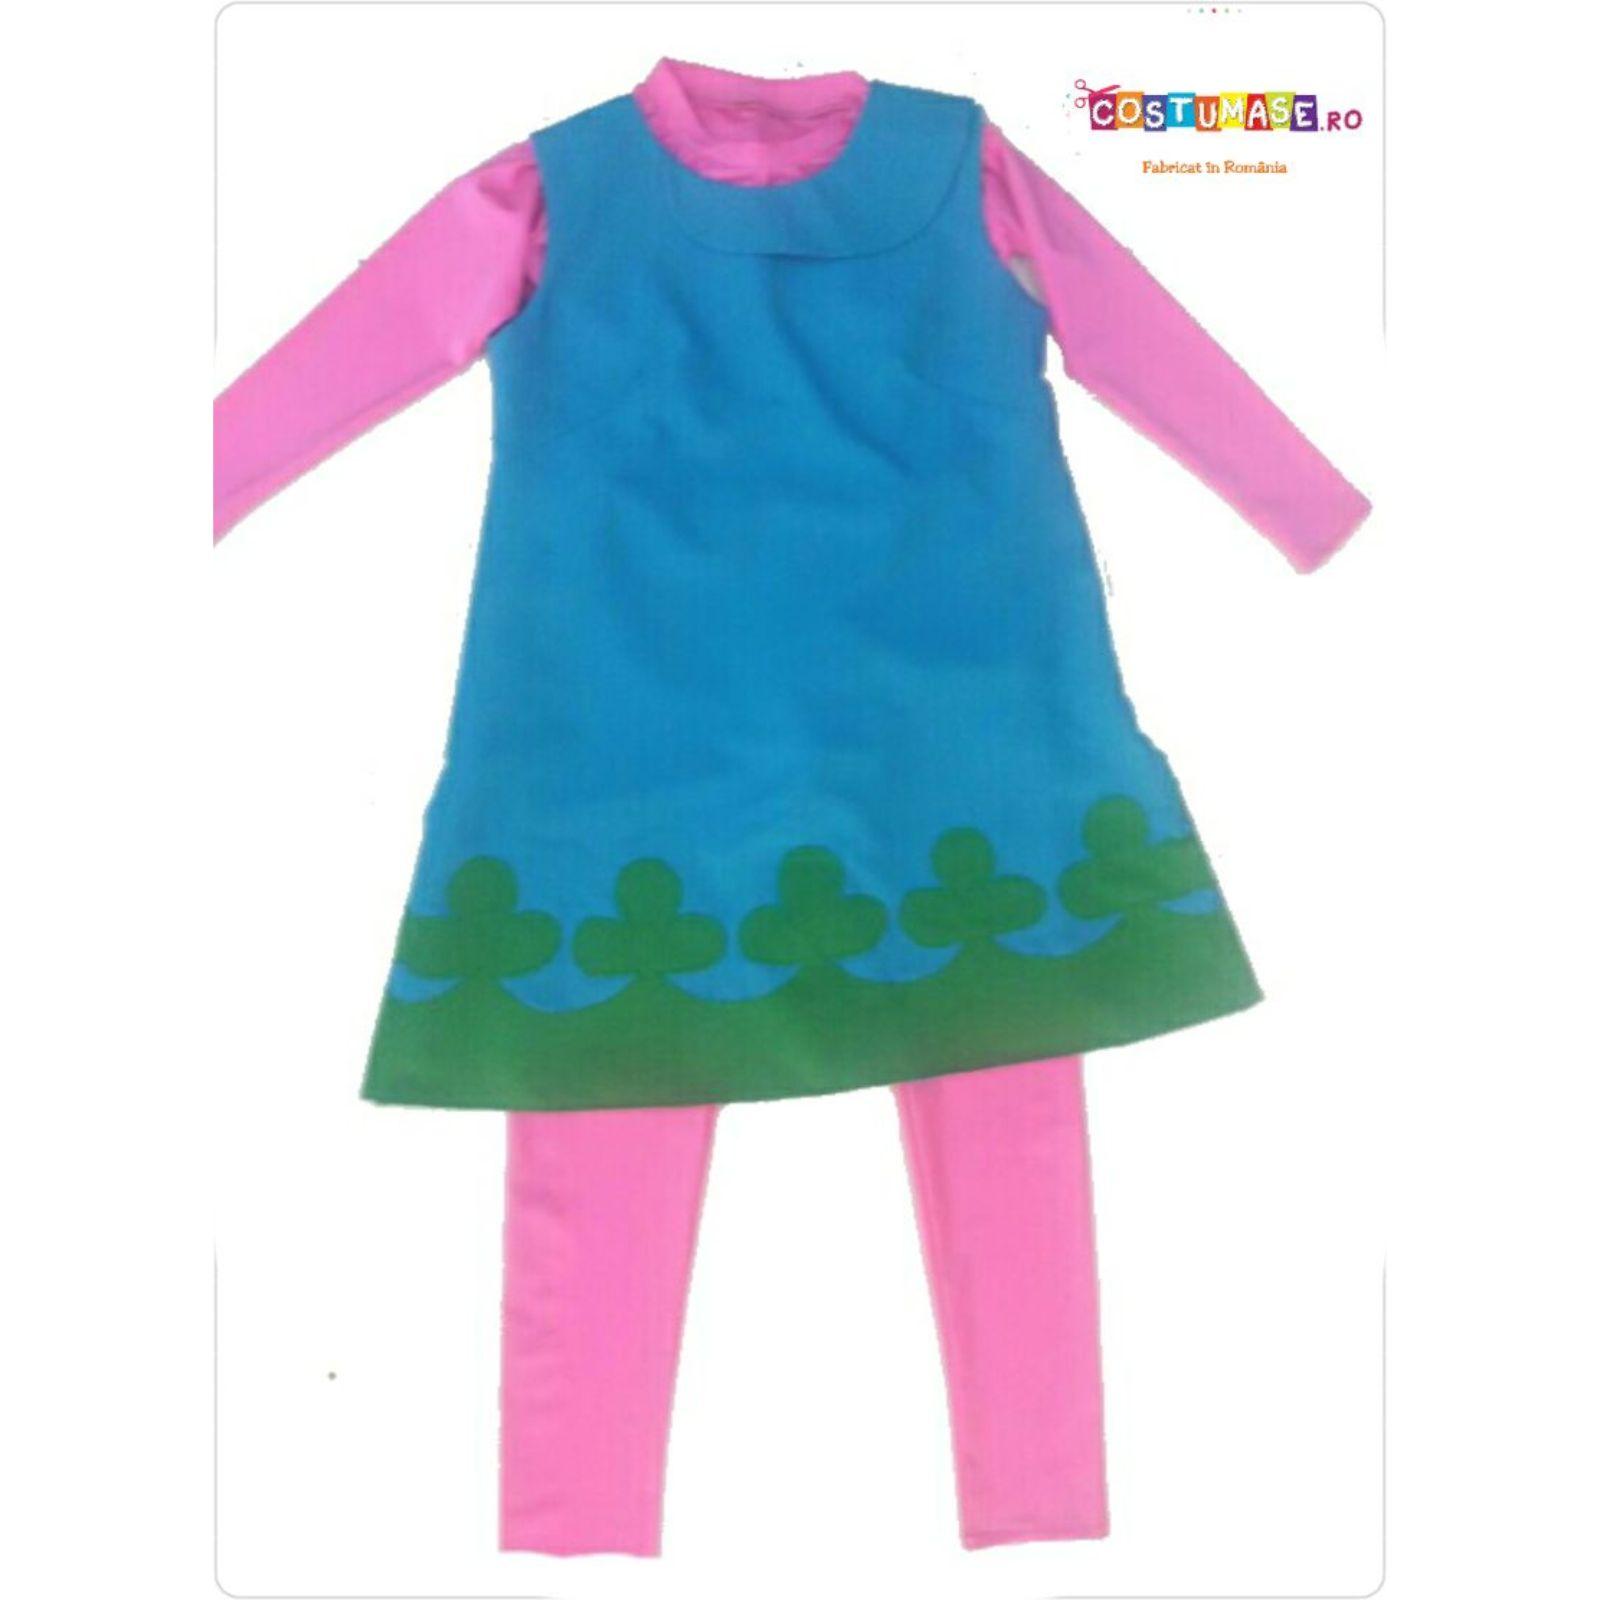 Costumas Branch 1